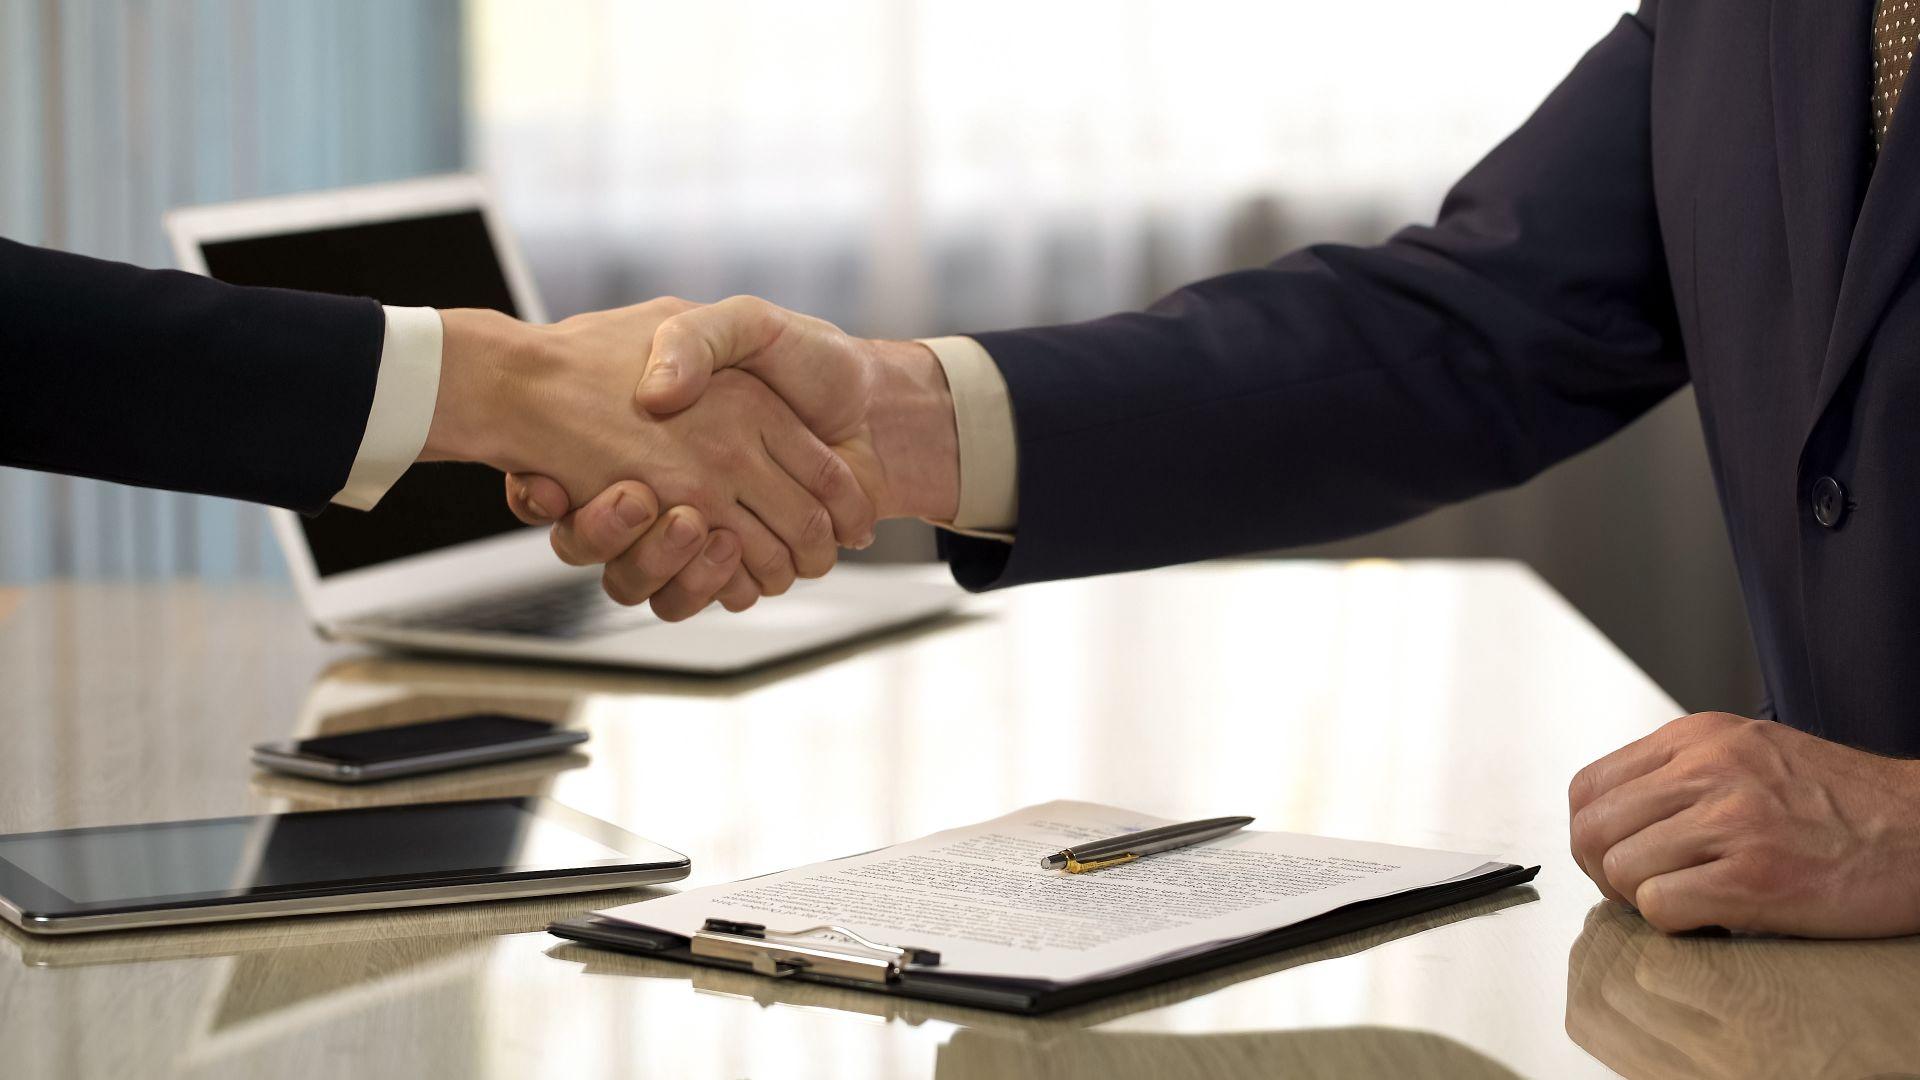 «Vos collaborateurs immobiliers ont-ils le permisd'exercer ?», Caroline Dubuis Talayrach, avocat